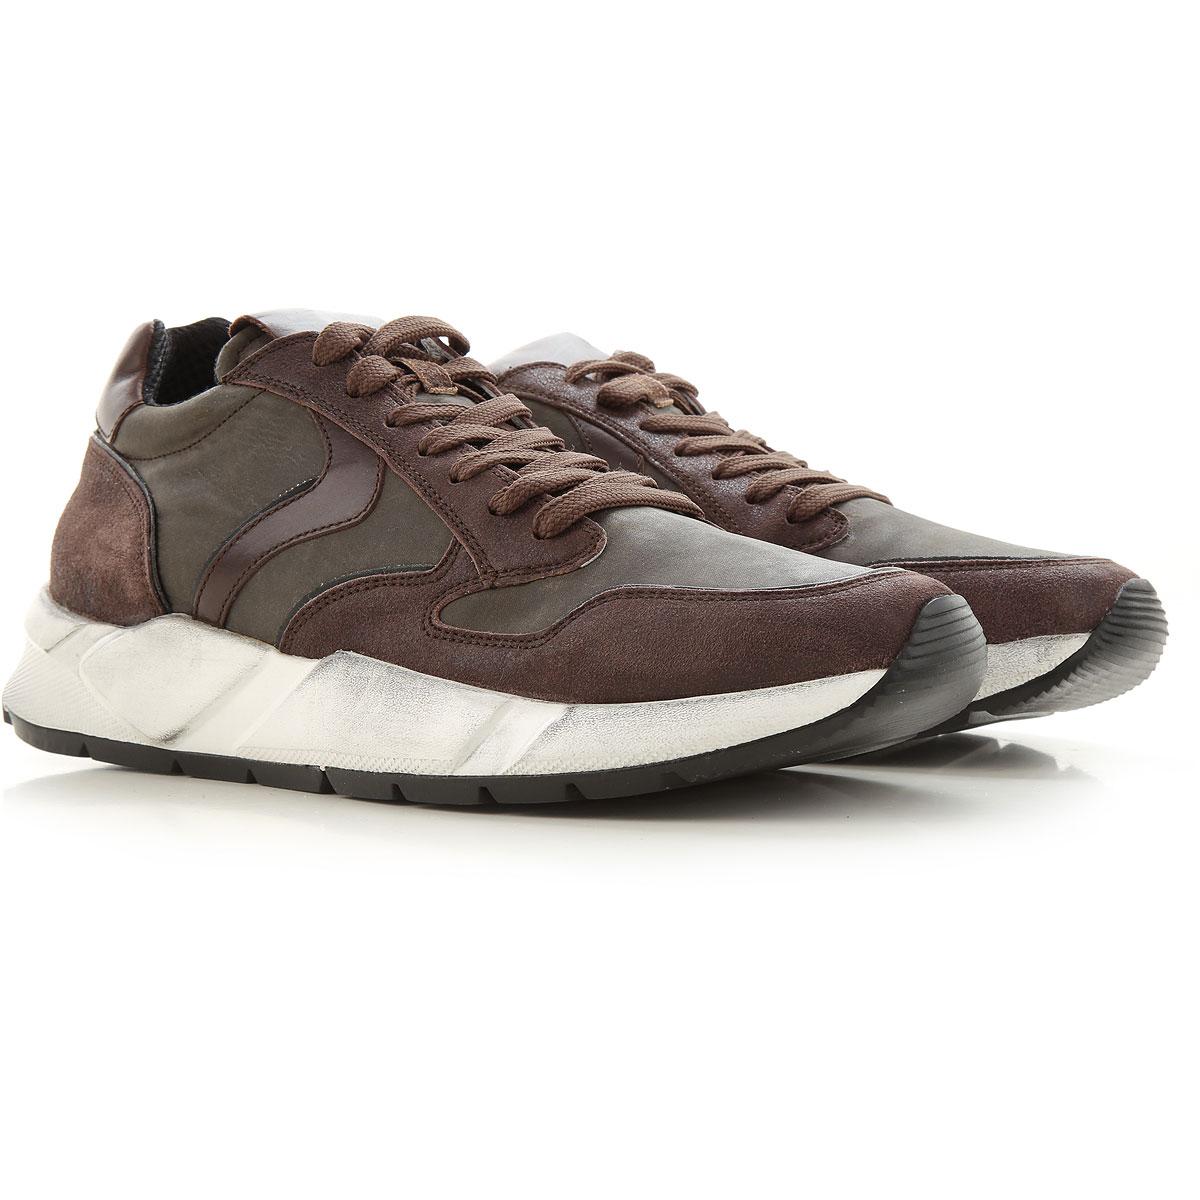 Voile Blanche Sneakers for Men On Sale, Dark Brown, Nylon, 2019, 10 11.5 8 9